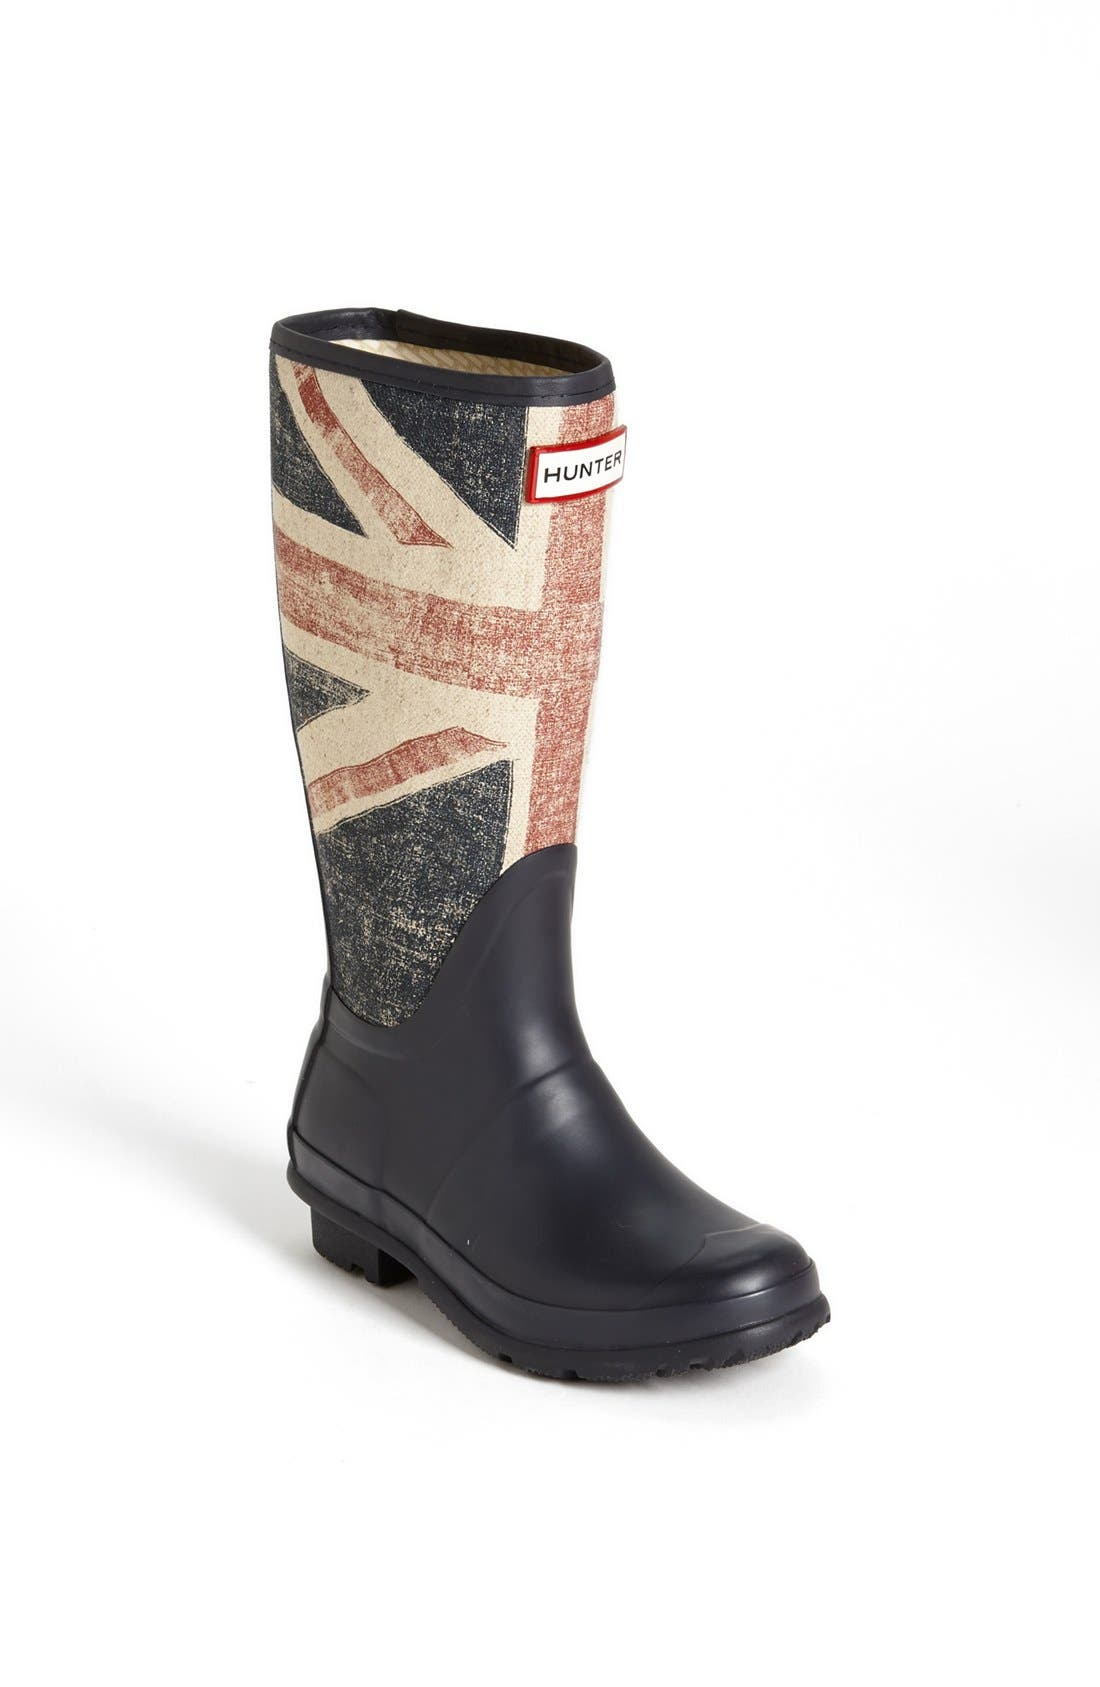 Alternate Image 1 Selected - Hunter 'Brit' Waterproof Rain Boot (Little Kid & Big Kid)